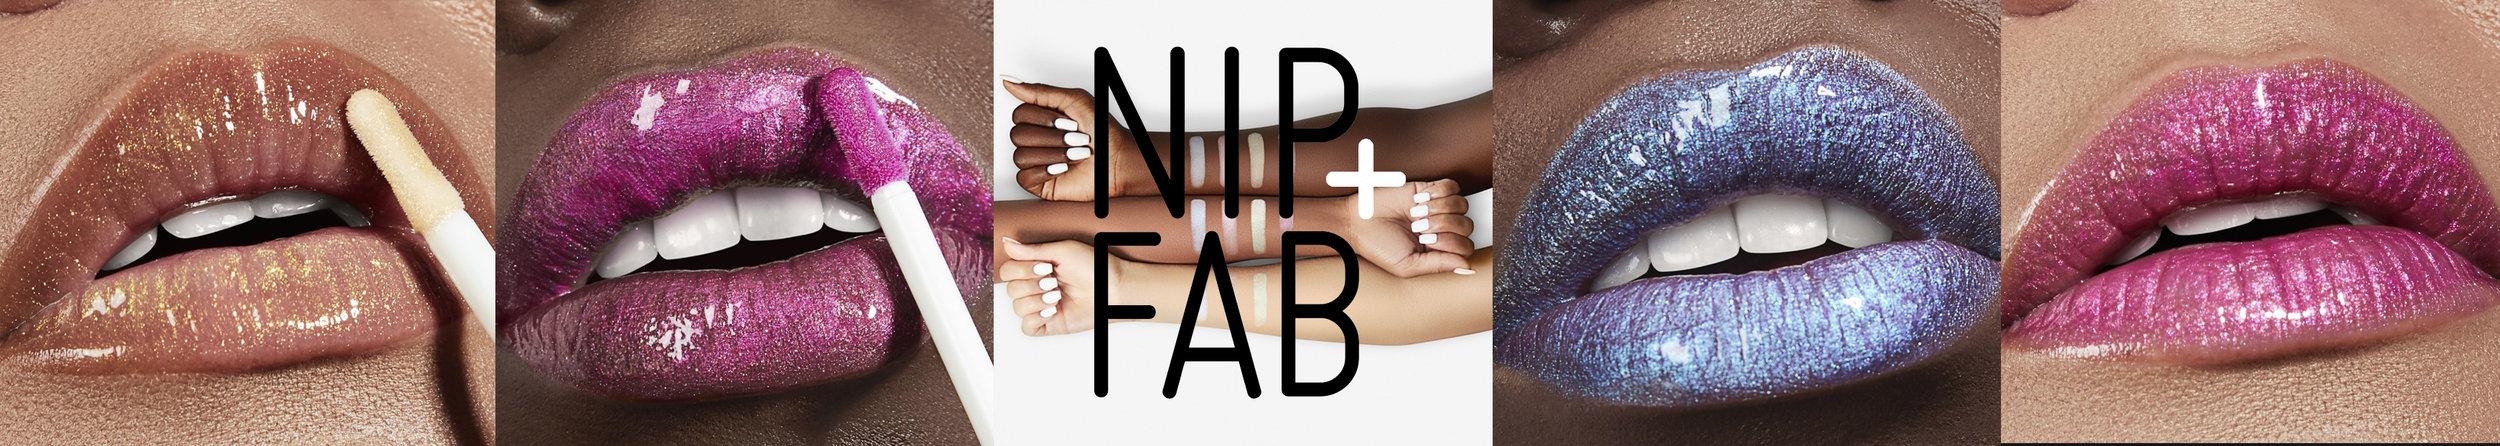 NIP+FAB.jpg